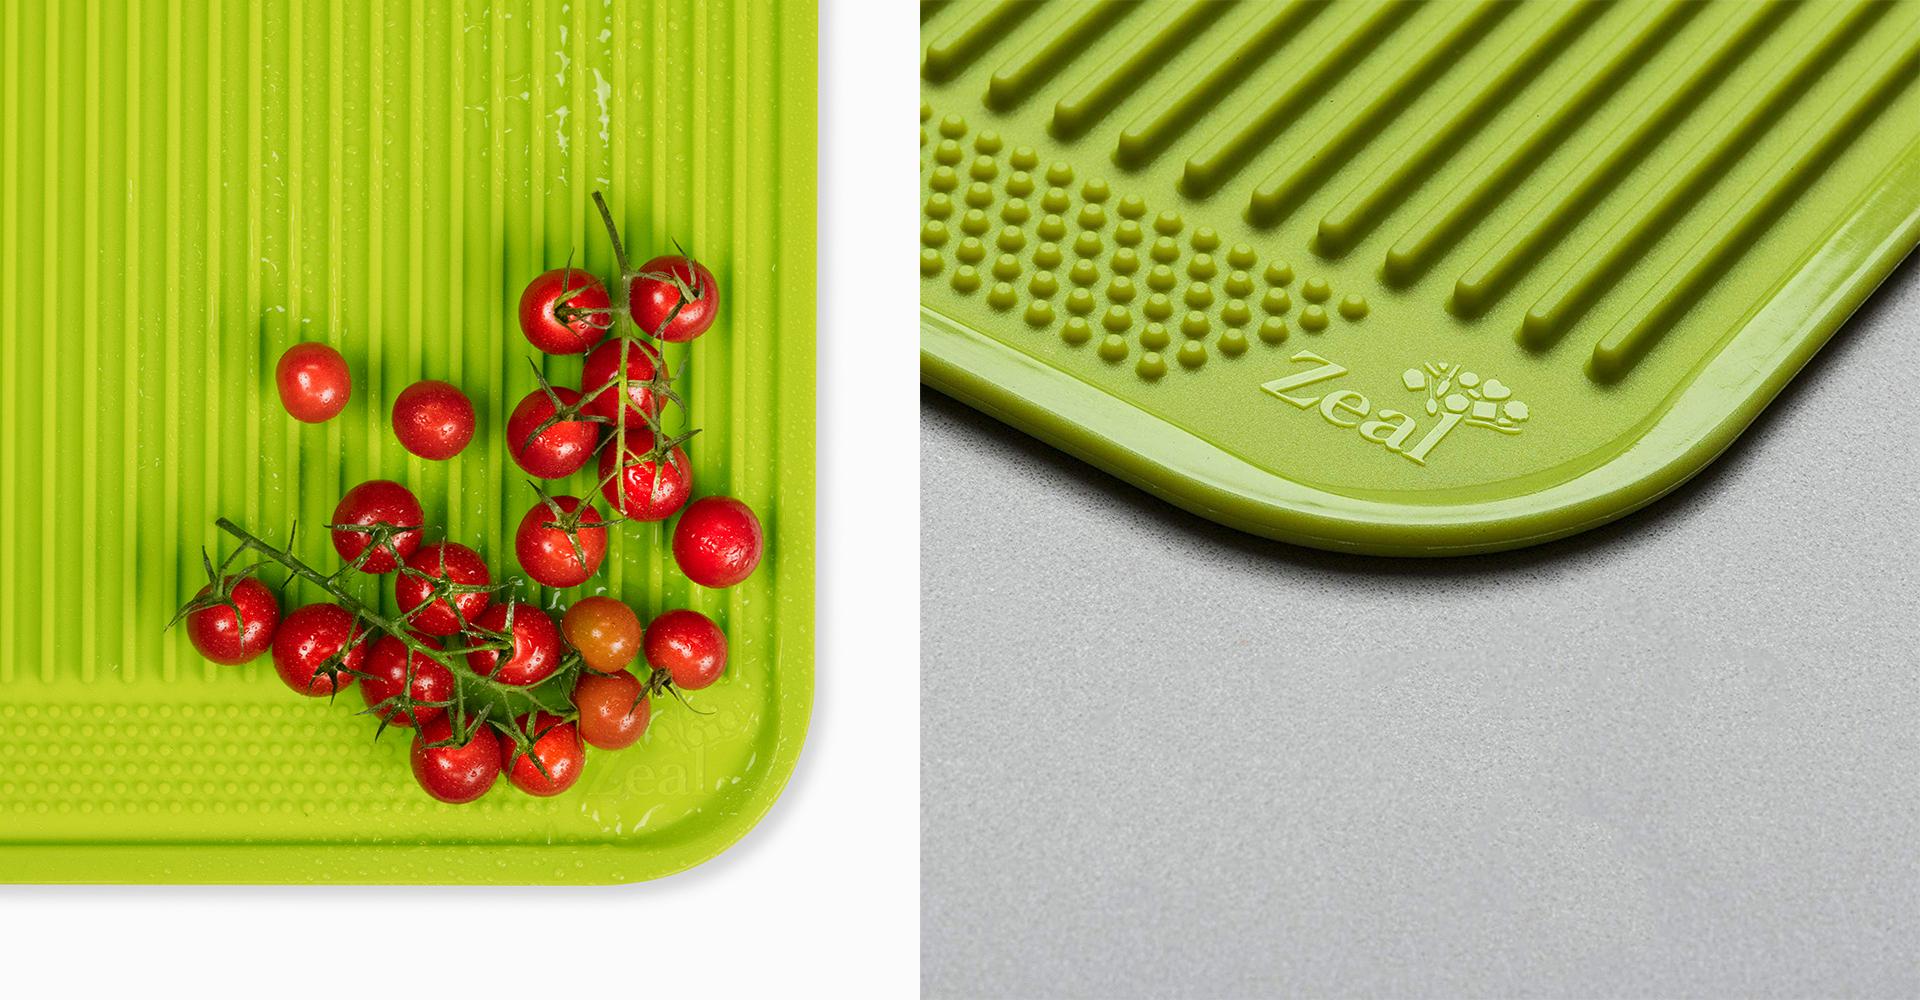 CKS Zeal 2018 range| Draining mat - CKS - Zeal - Kitchen - Design - Texture - Detail shot - Photography - Tomato - Red - Green - Detail - Product - Mat - Silicone